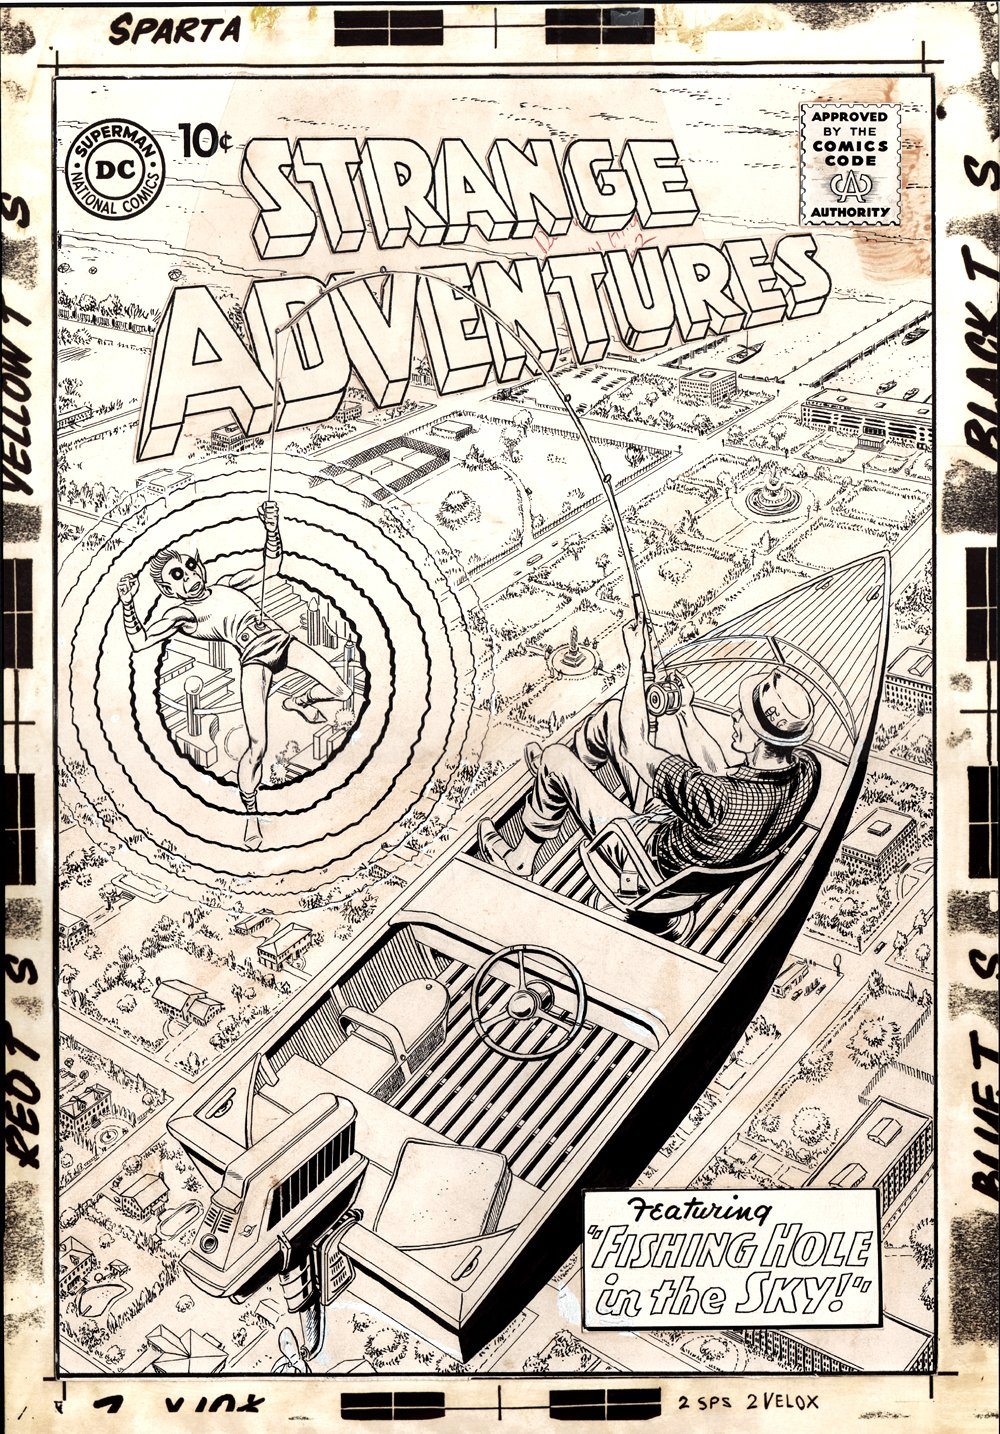 Strange Adventures #135 Cover (Large Art) 1961